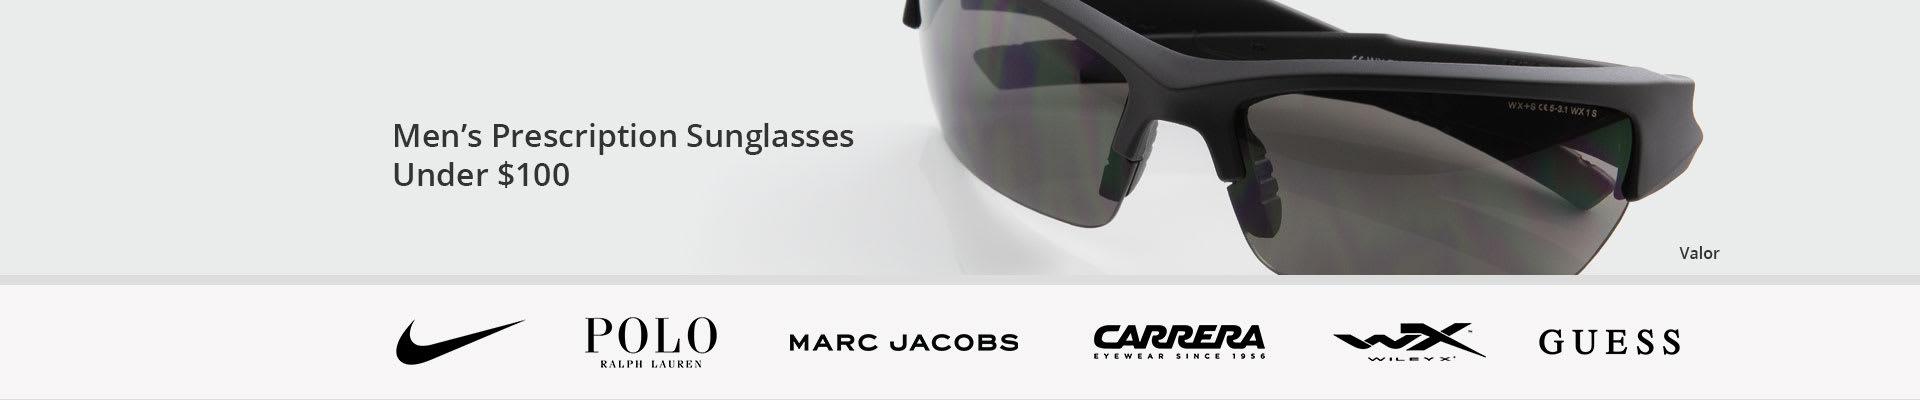 Men's Prescription Sunglasses Under $100